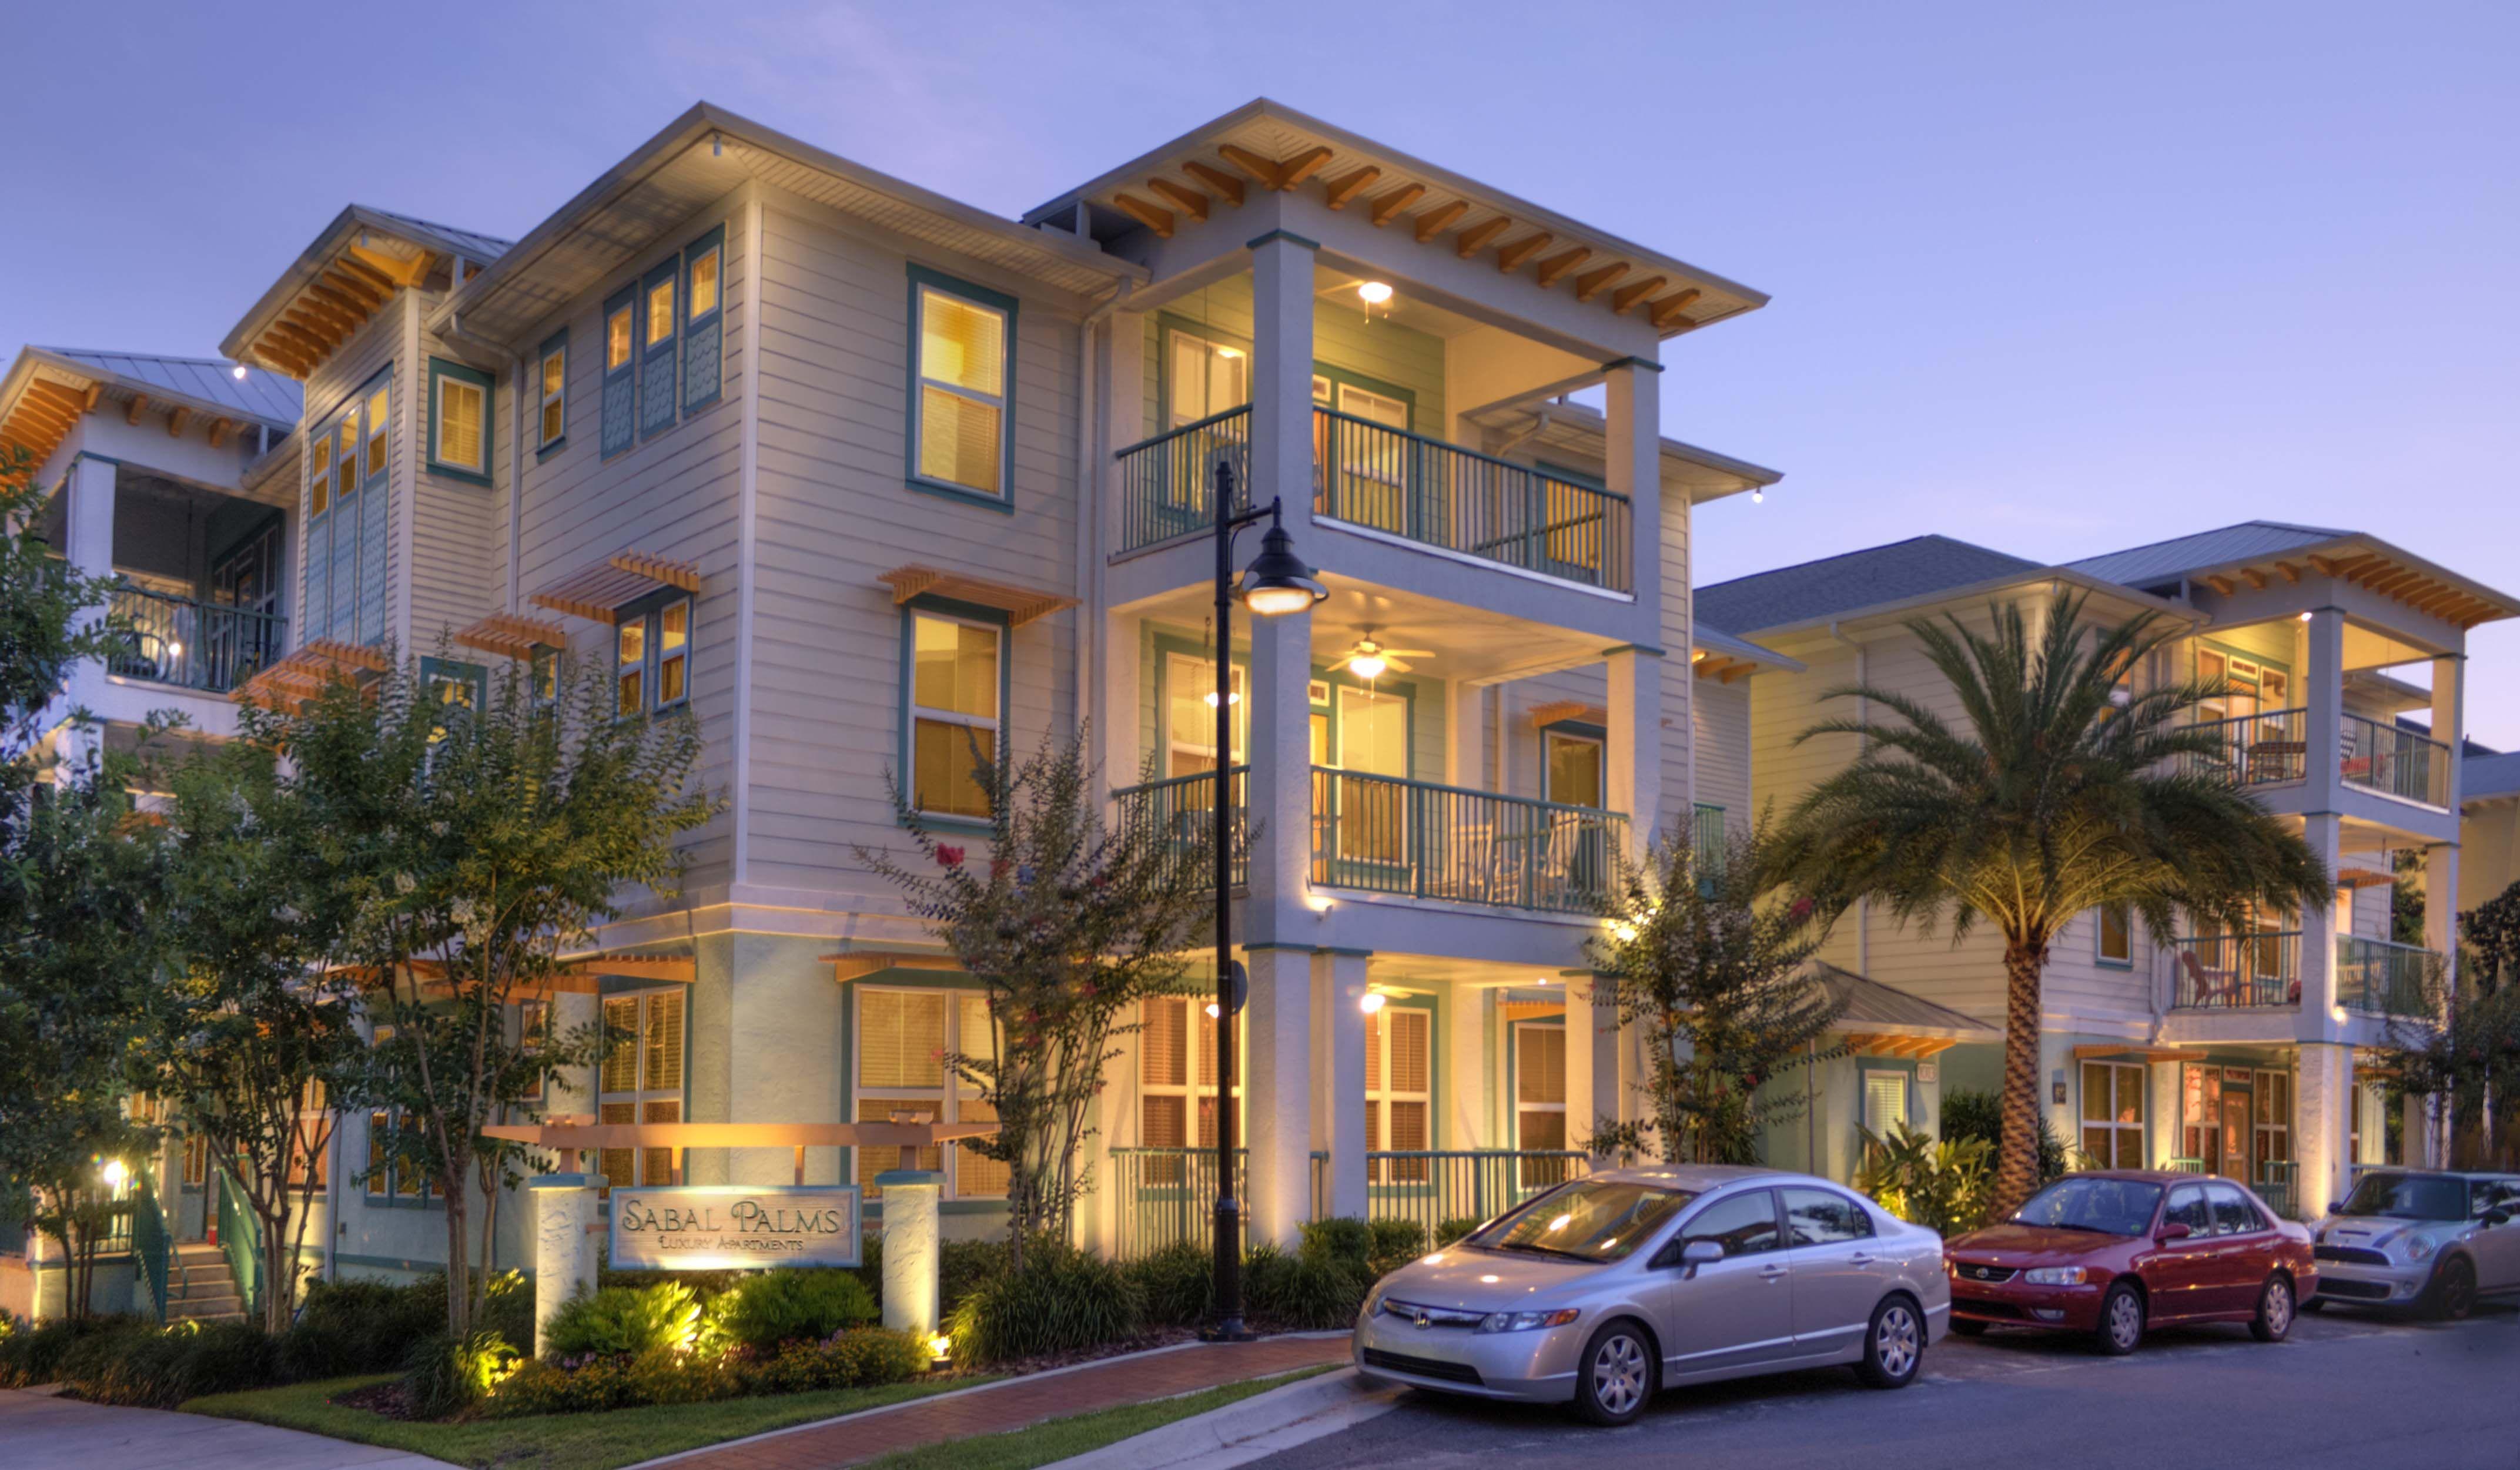 Dusk View of the Luxurios Sabal Palms Apartments near